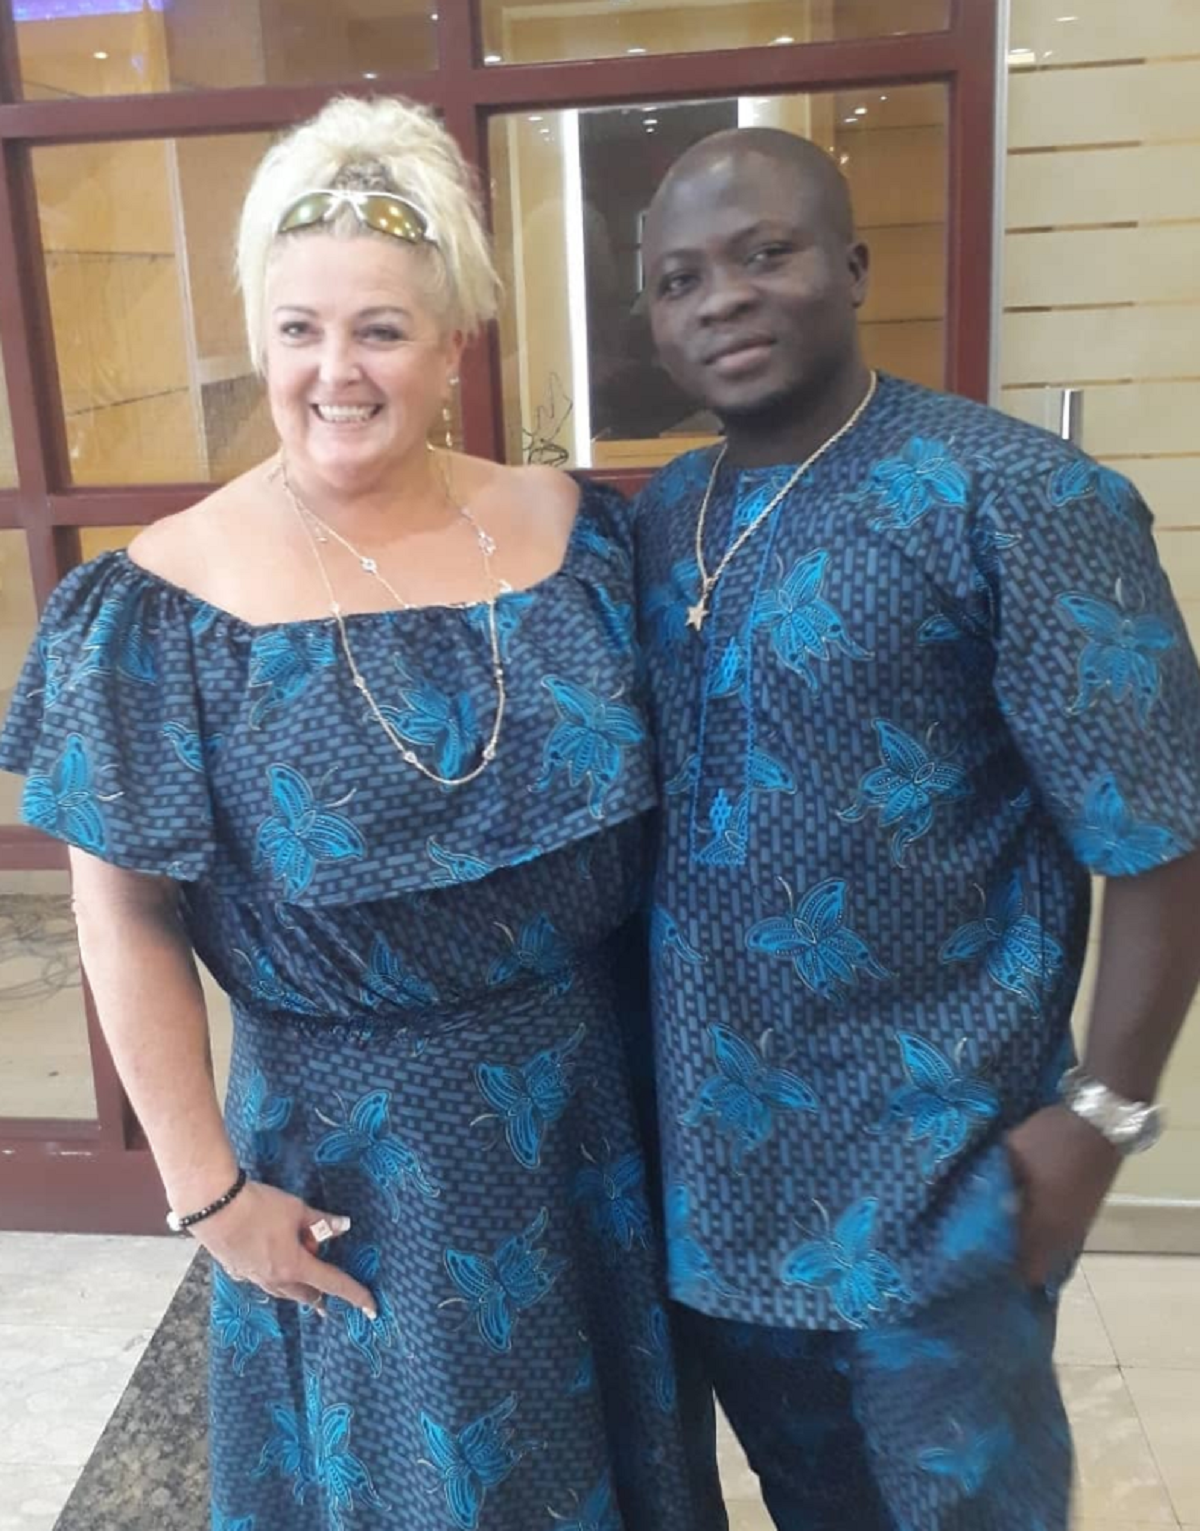 Angela Deem and Michael Ilesanmi